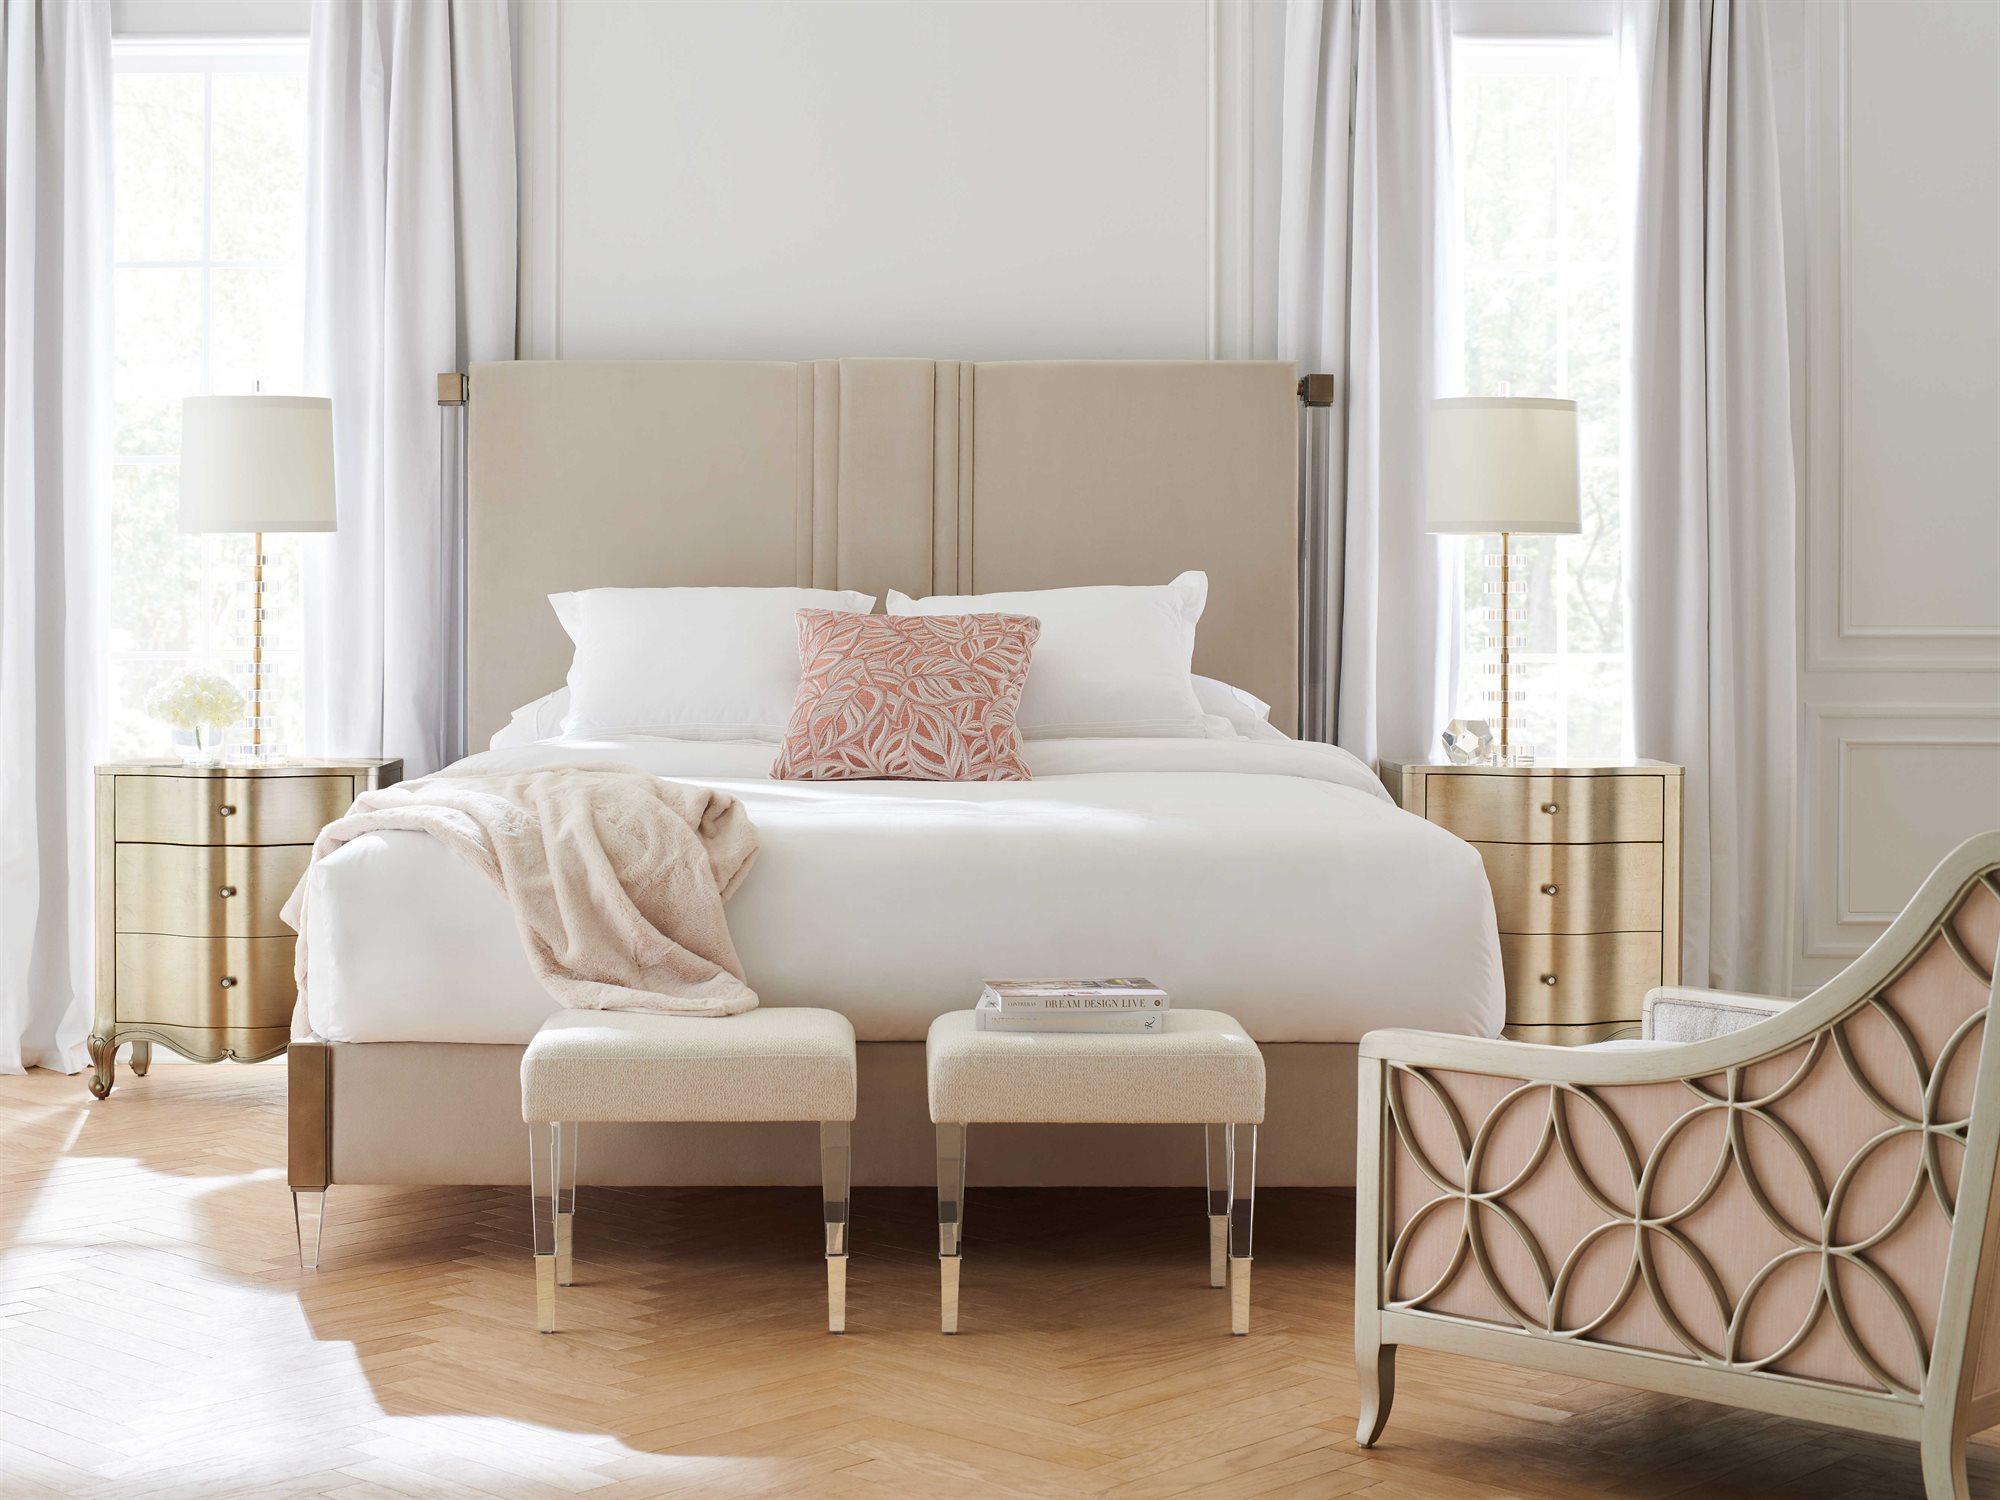 Caracole Caracole Classic Bedroom Set Caccla019102set